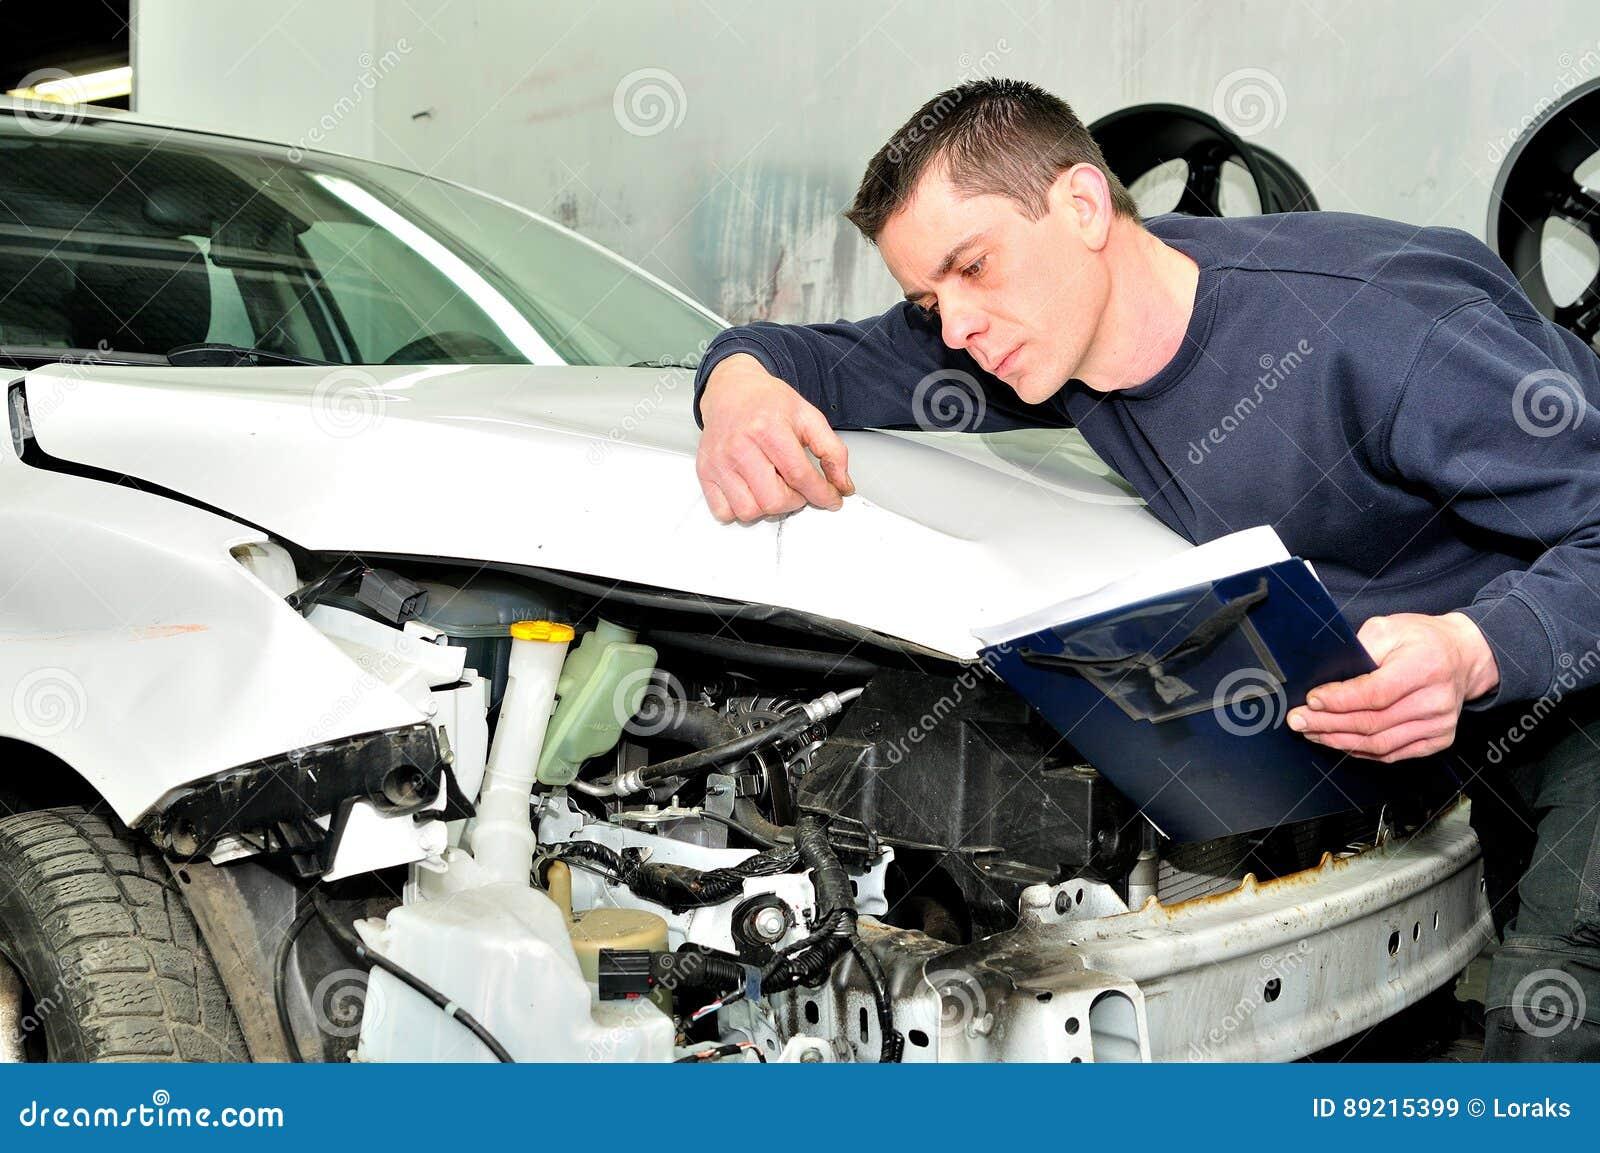 Car Repair Insurance >> Mechanic Inspecting Car Body Damage At Auto Repair Shop